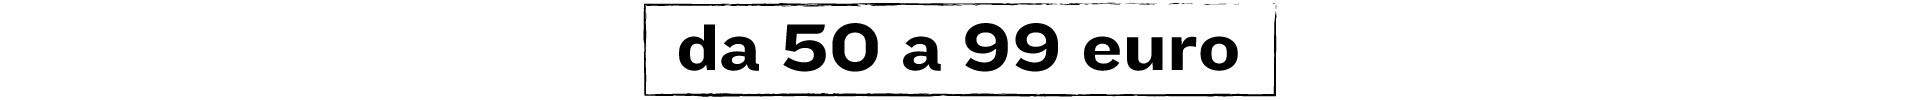 da-50-a-99-euro.jpg